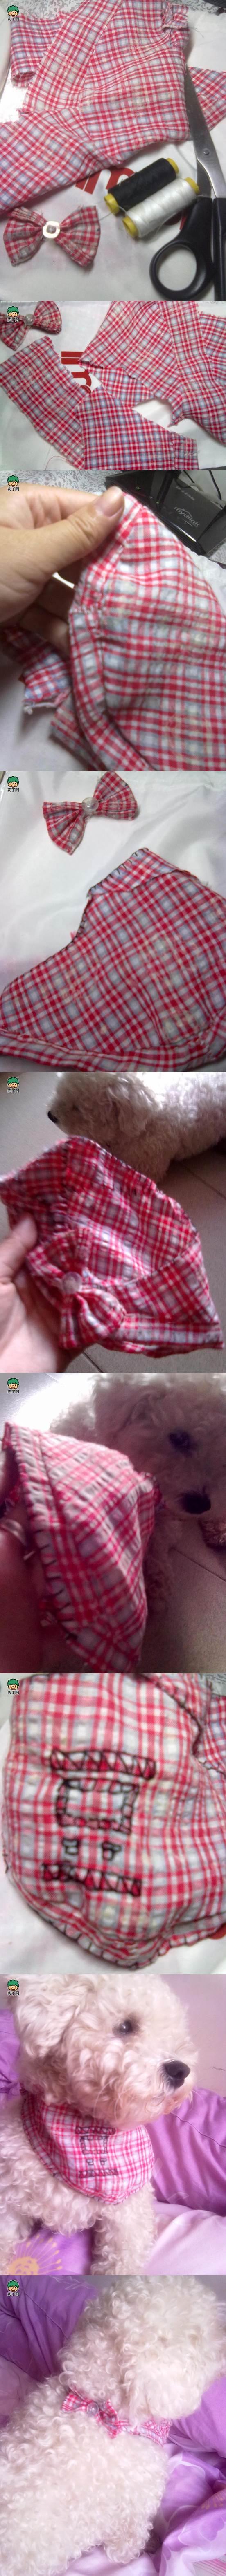 DIY Dog Clothes 2